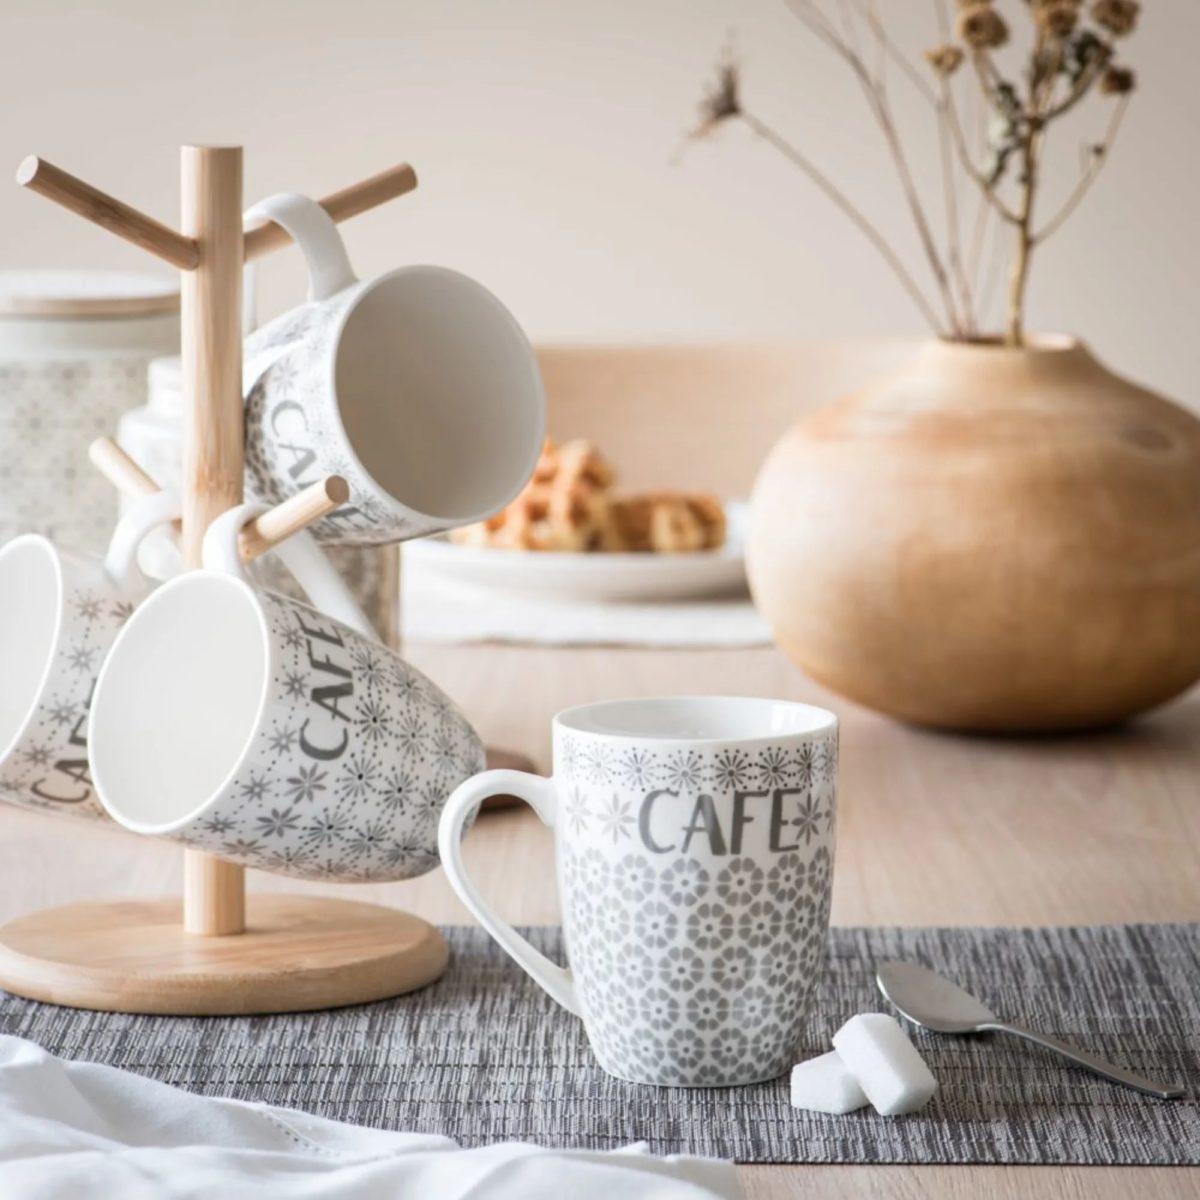 maisons-du-monde-natale-2019-collezione-natural-christmas-mug-in-porcellana